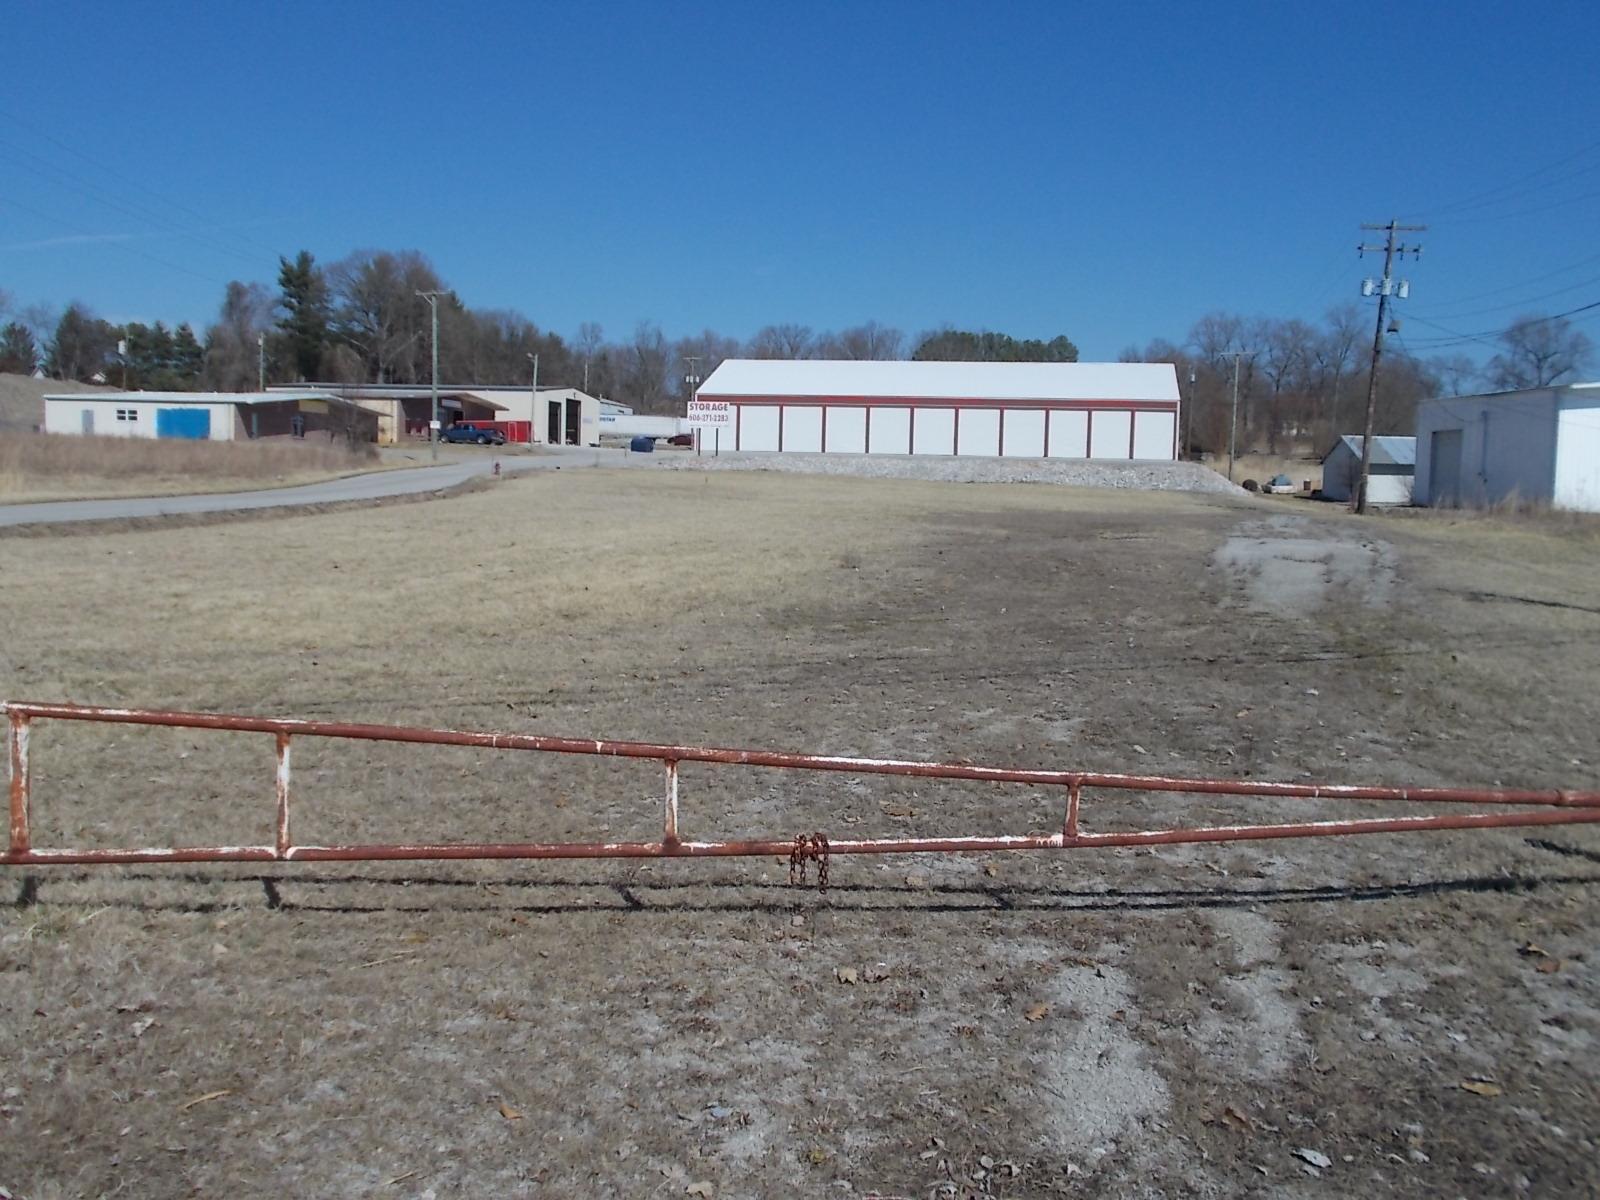 Lot 1 & 30 Hwy 27, Burnside, Kentucky 42519